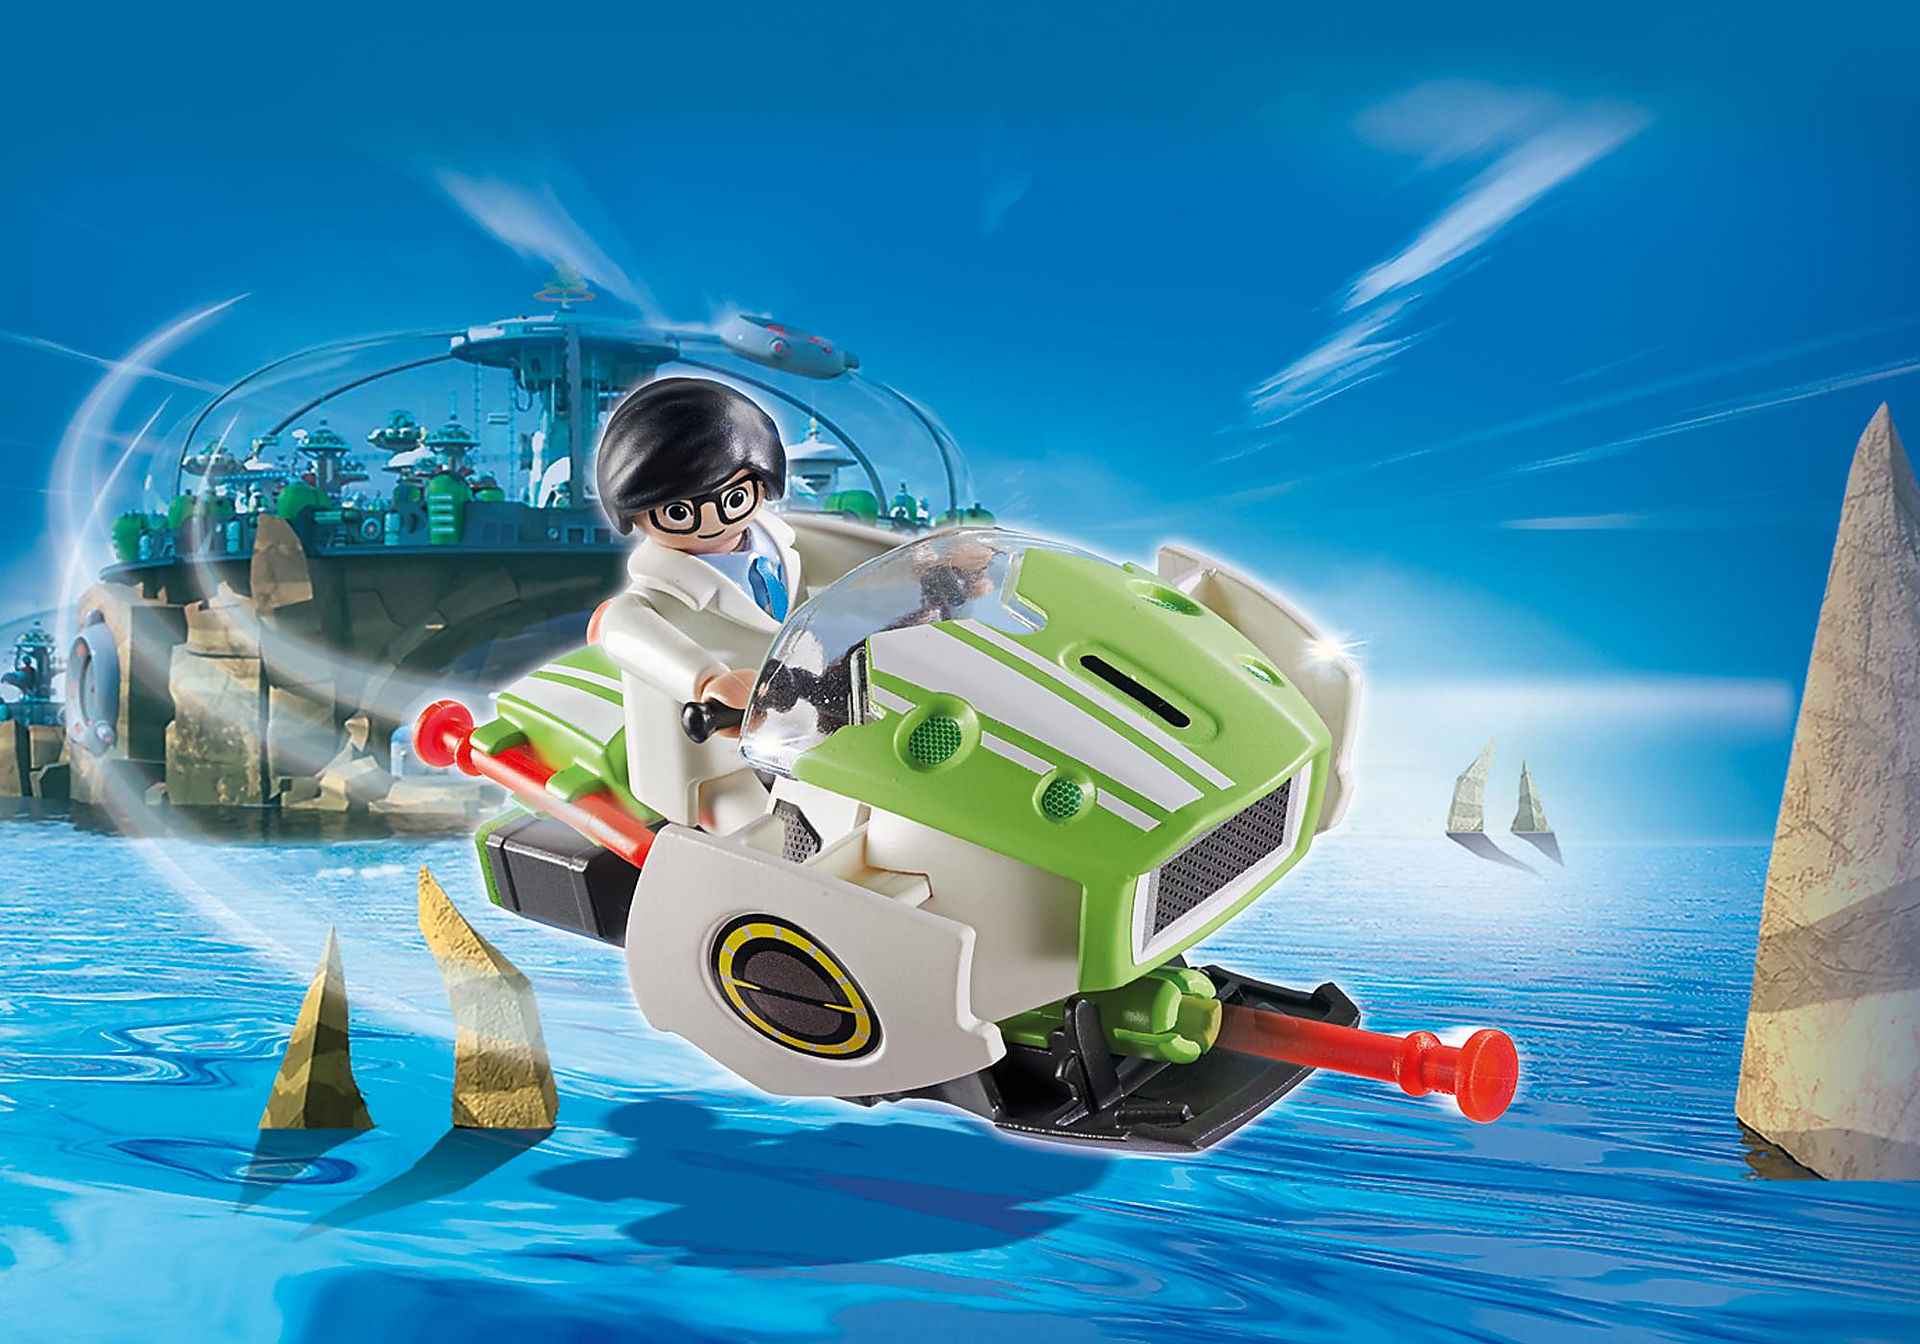 http://media.playmobil.com/i/playmobil/6691_product_detail/Скайджет